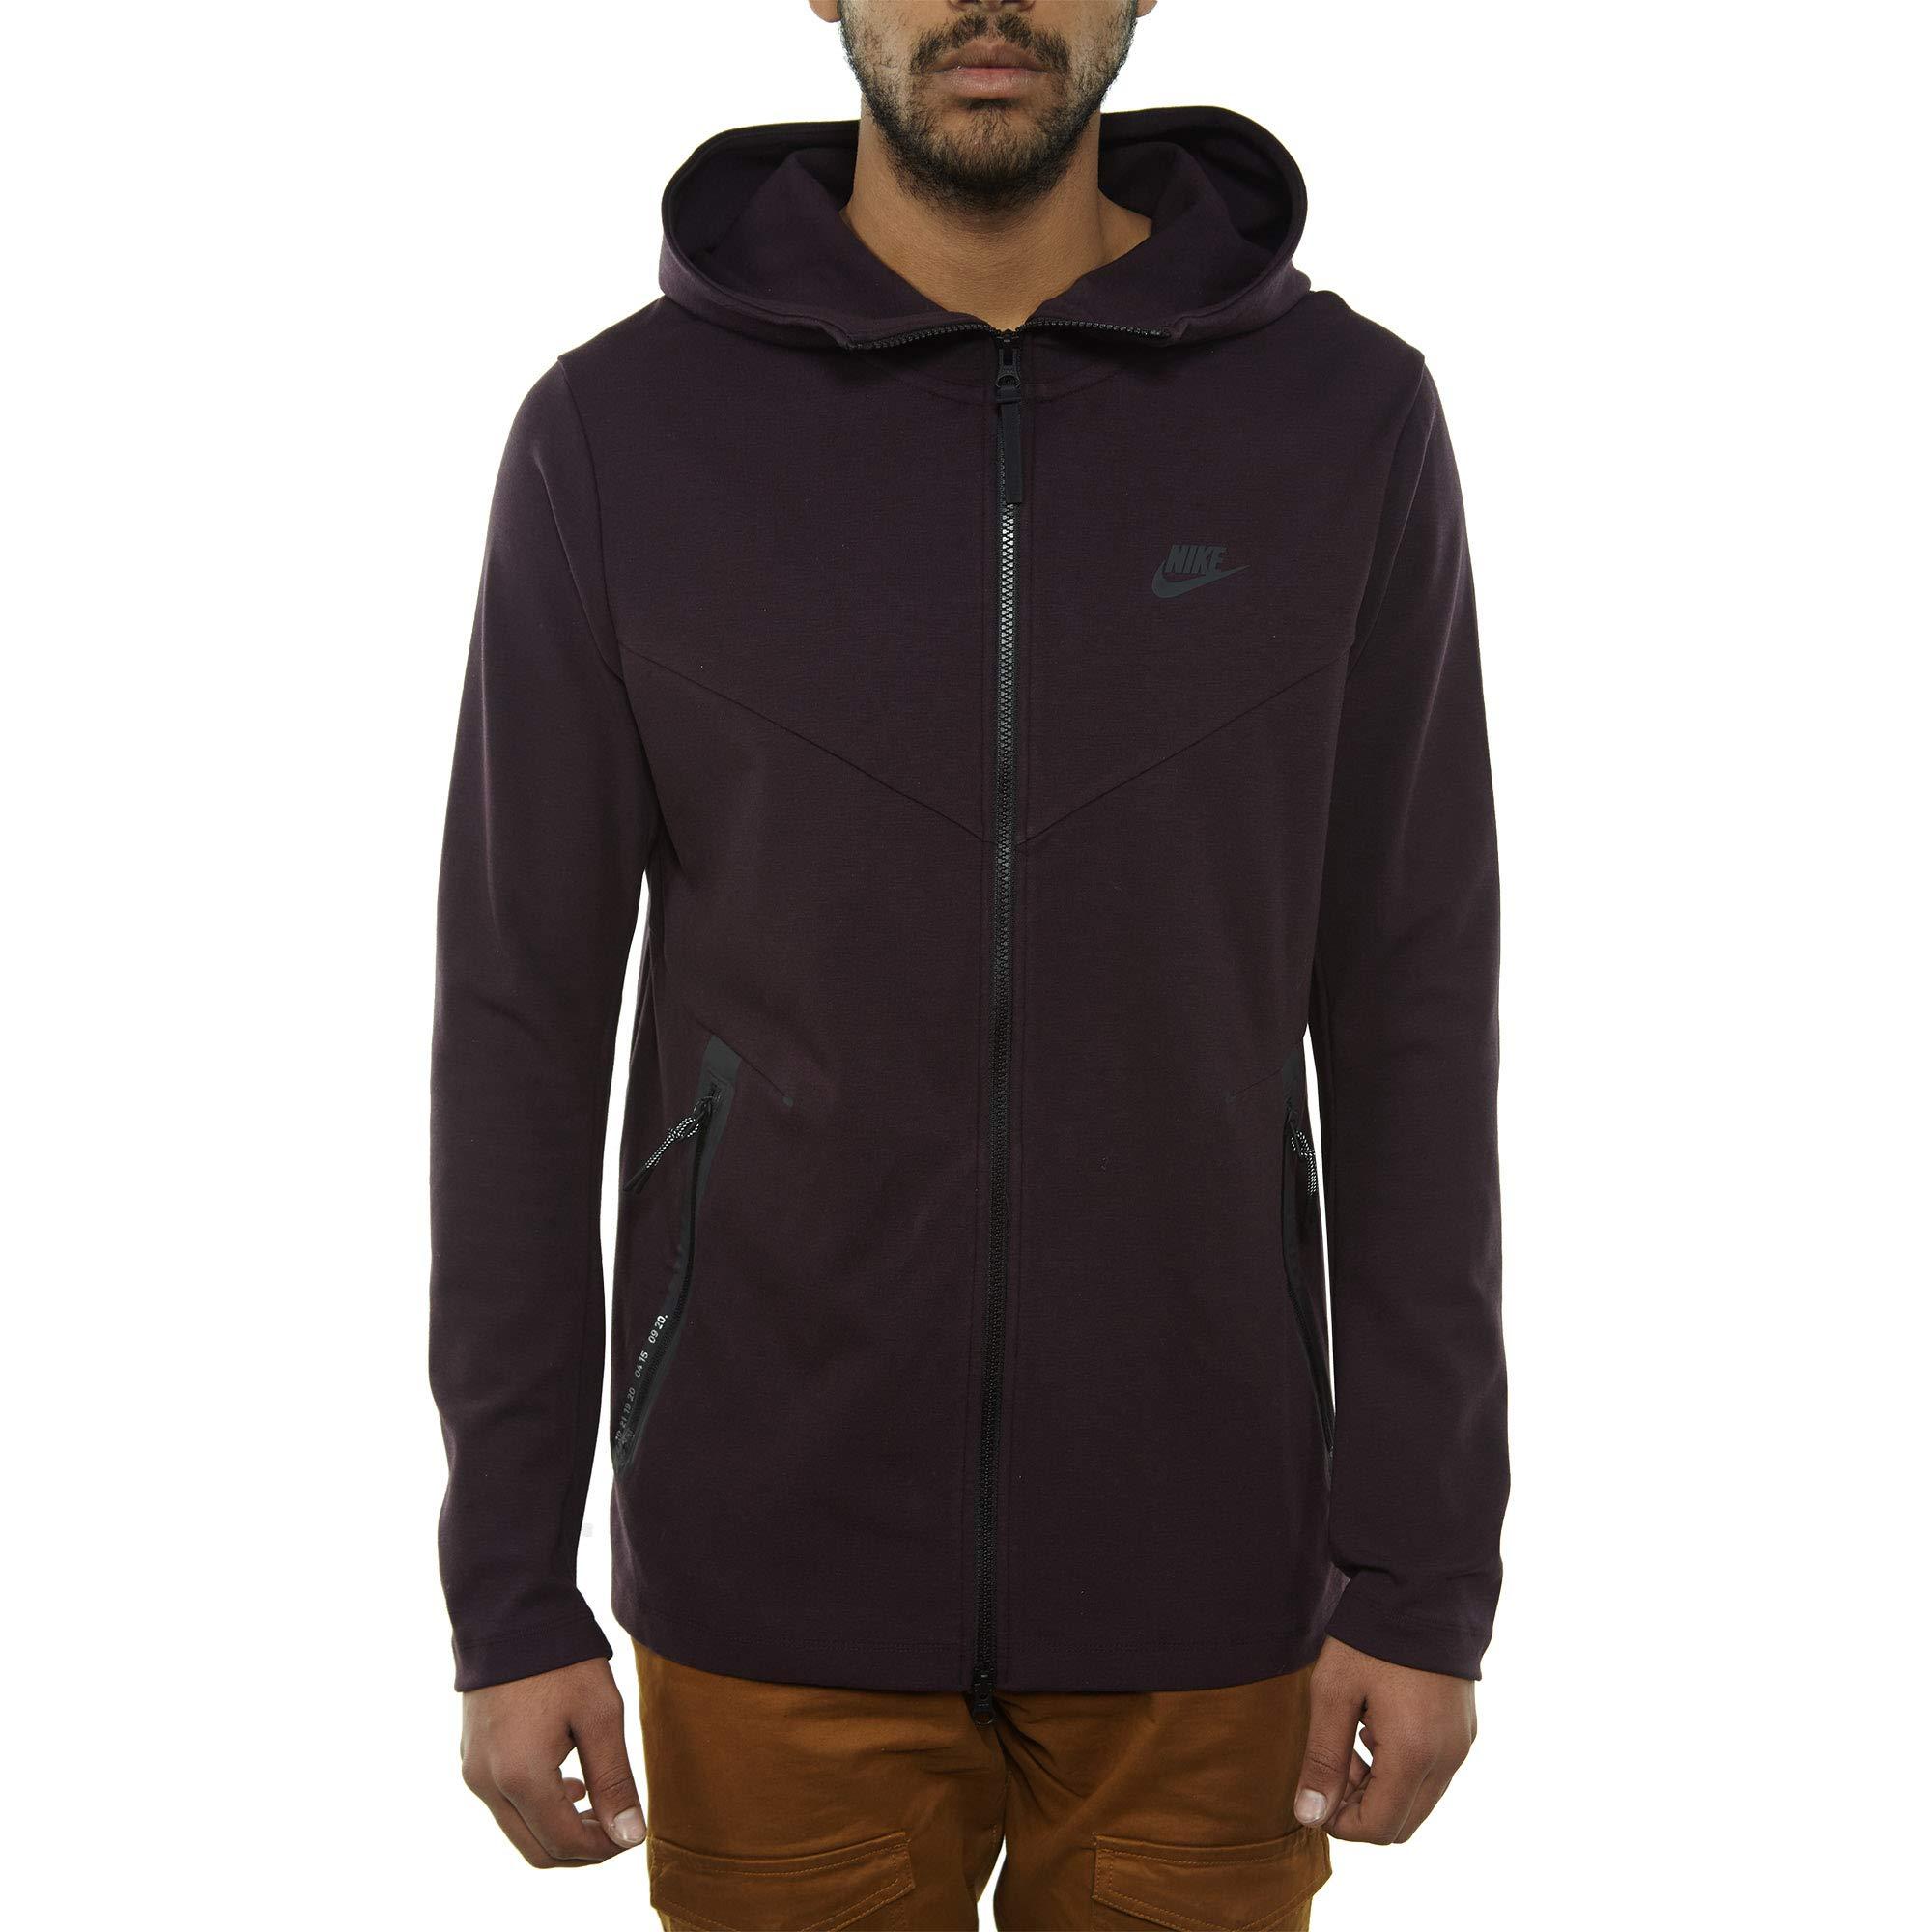 Nike Mens Tech Fleece Pack Full Zip Training Hoodie Burgundy Ash/Black AA3784-659 Size Small by Nike (Image #1)